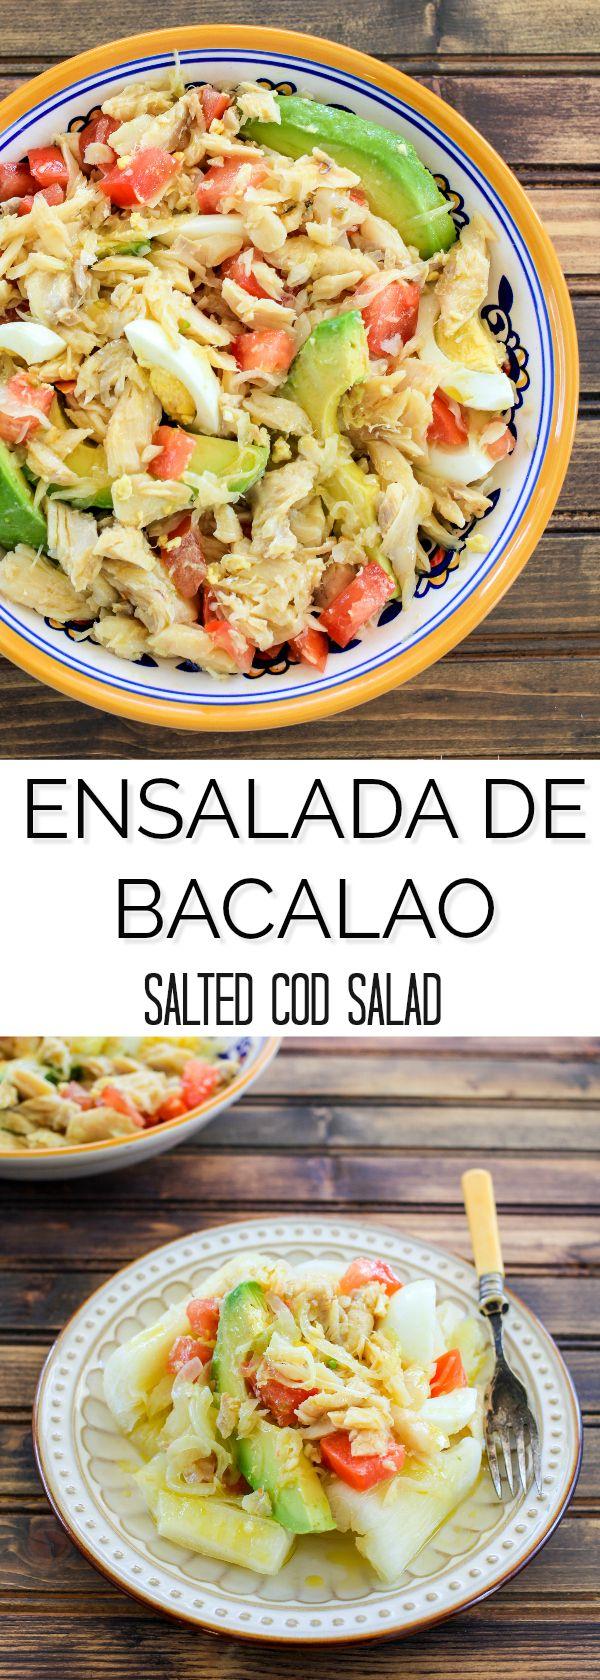 Ensalada de Bacalao (Salted Cod Salad) | TheNoshery